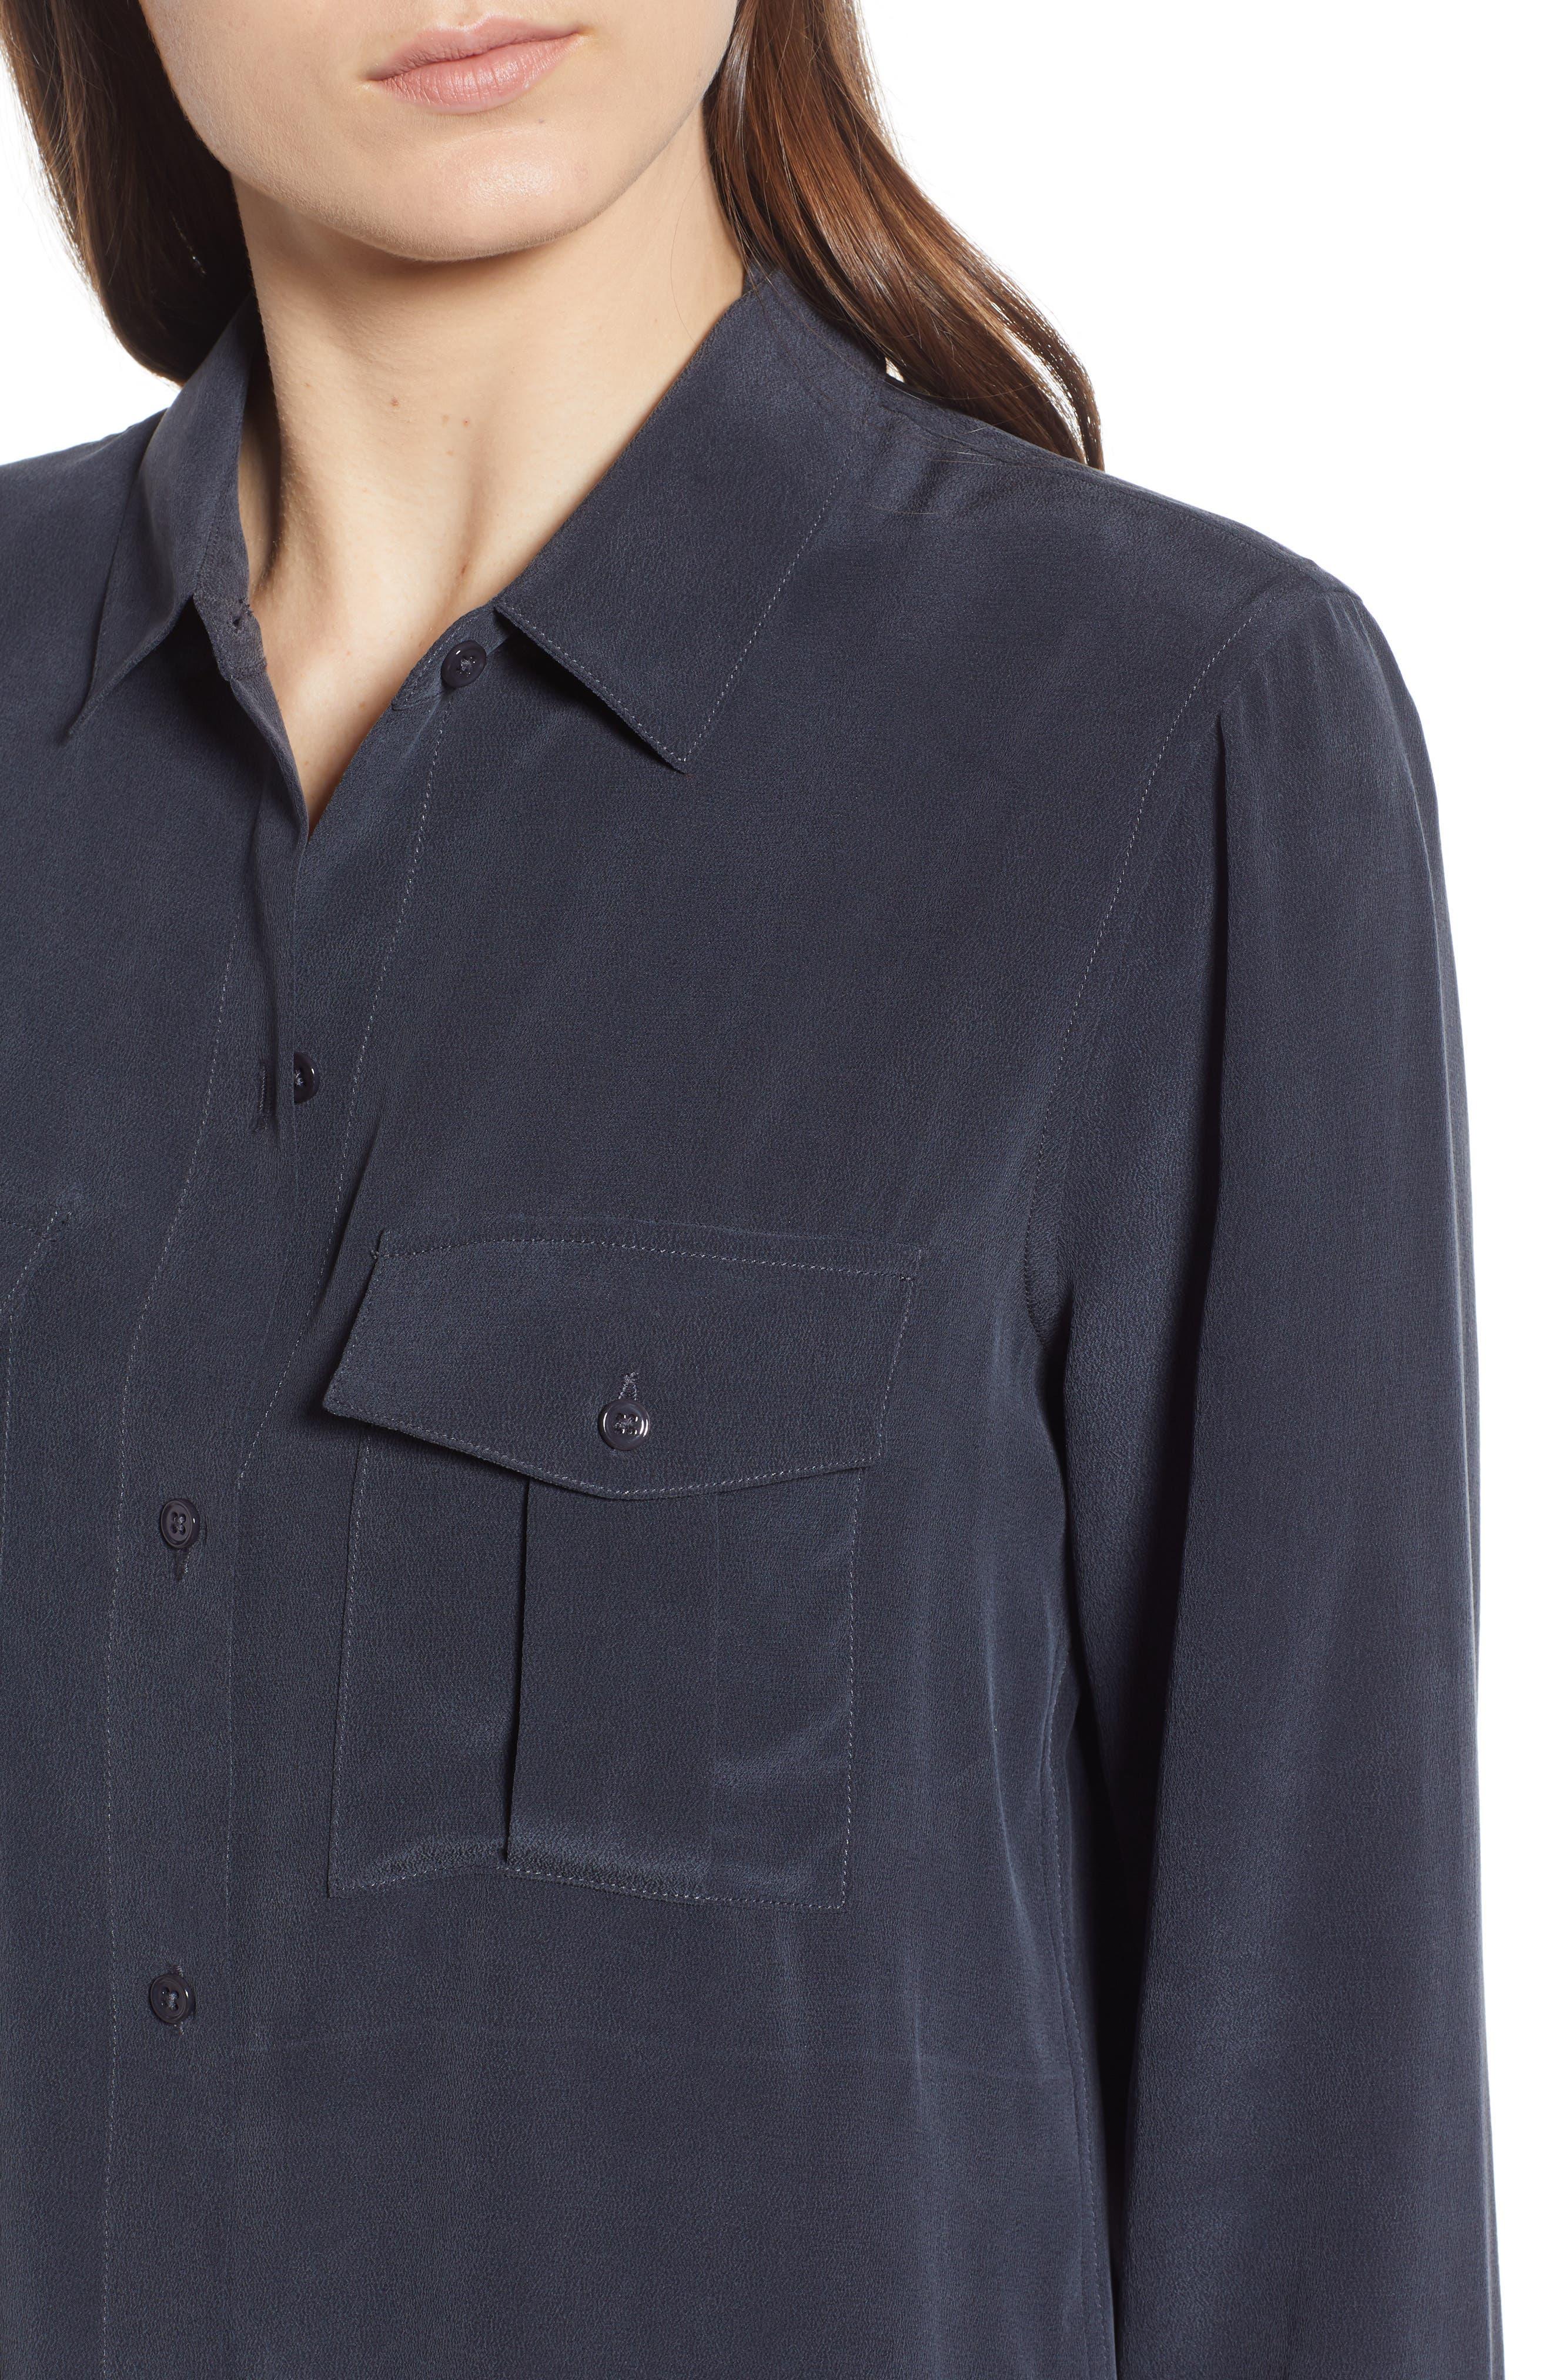 RAILS, Rhett Silk Shirt, Alternate thumbnail 4, color, 021